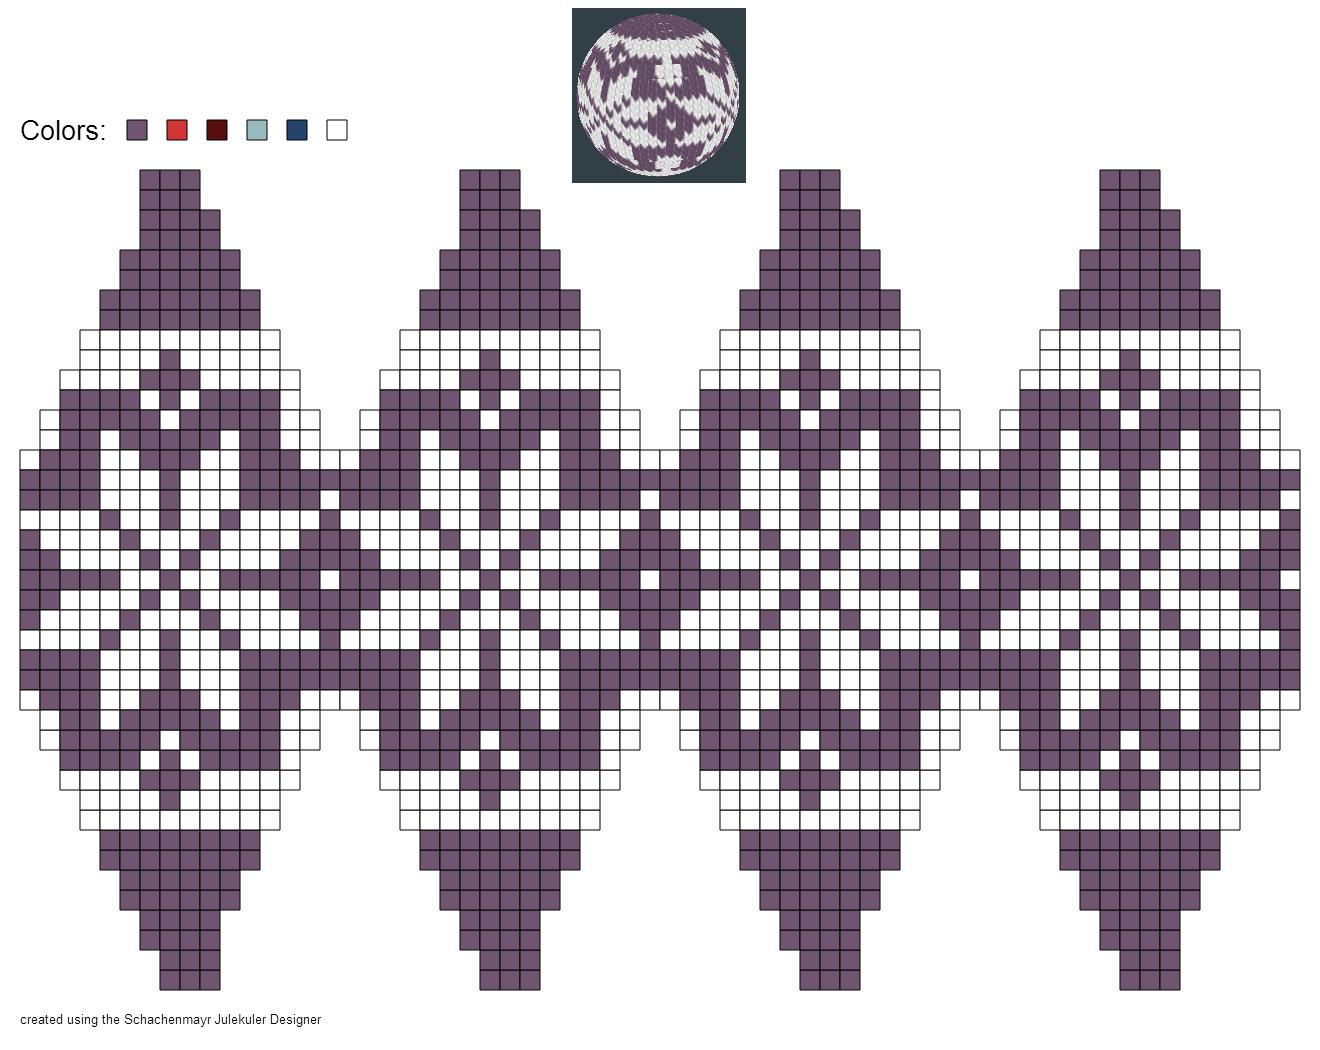 created using Schachenmayr #Julekuler Designer #christmas by Pawel Dolatowski